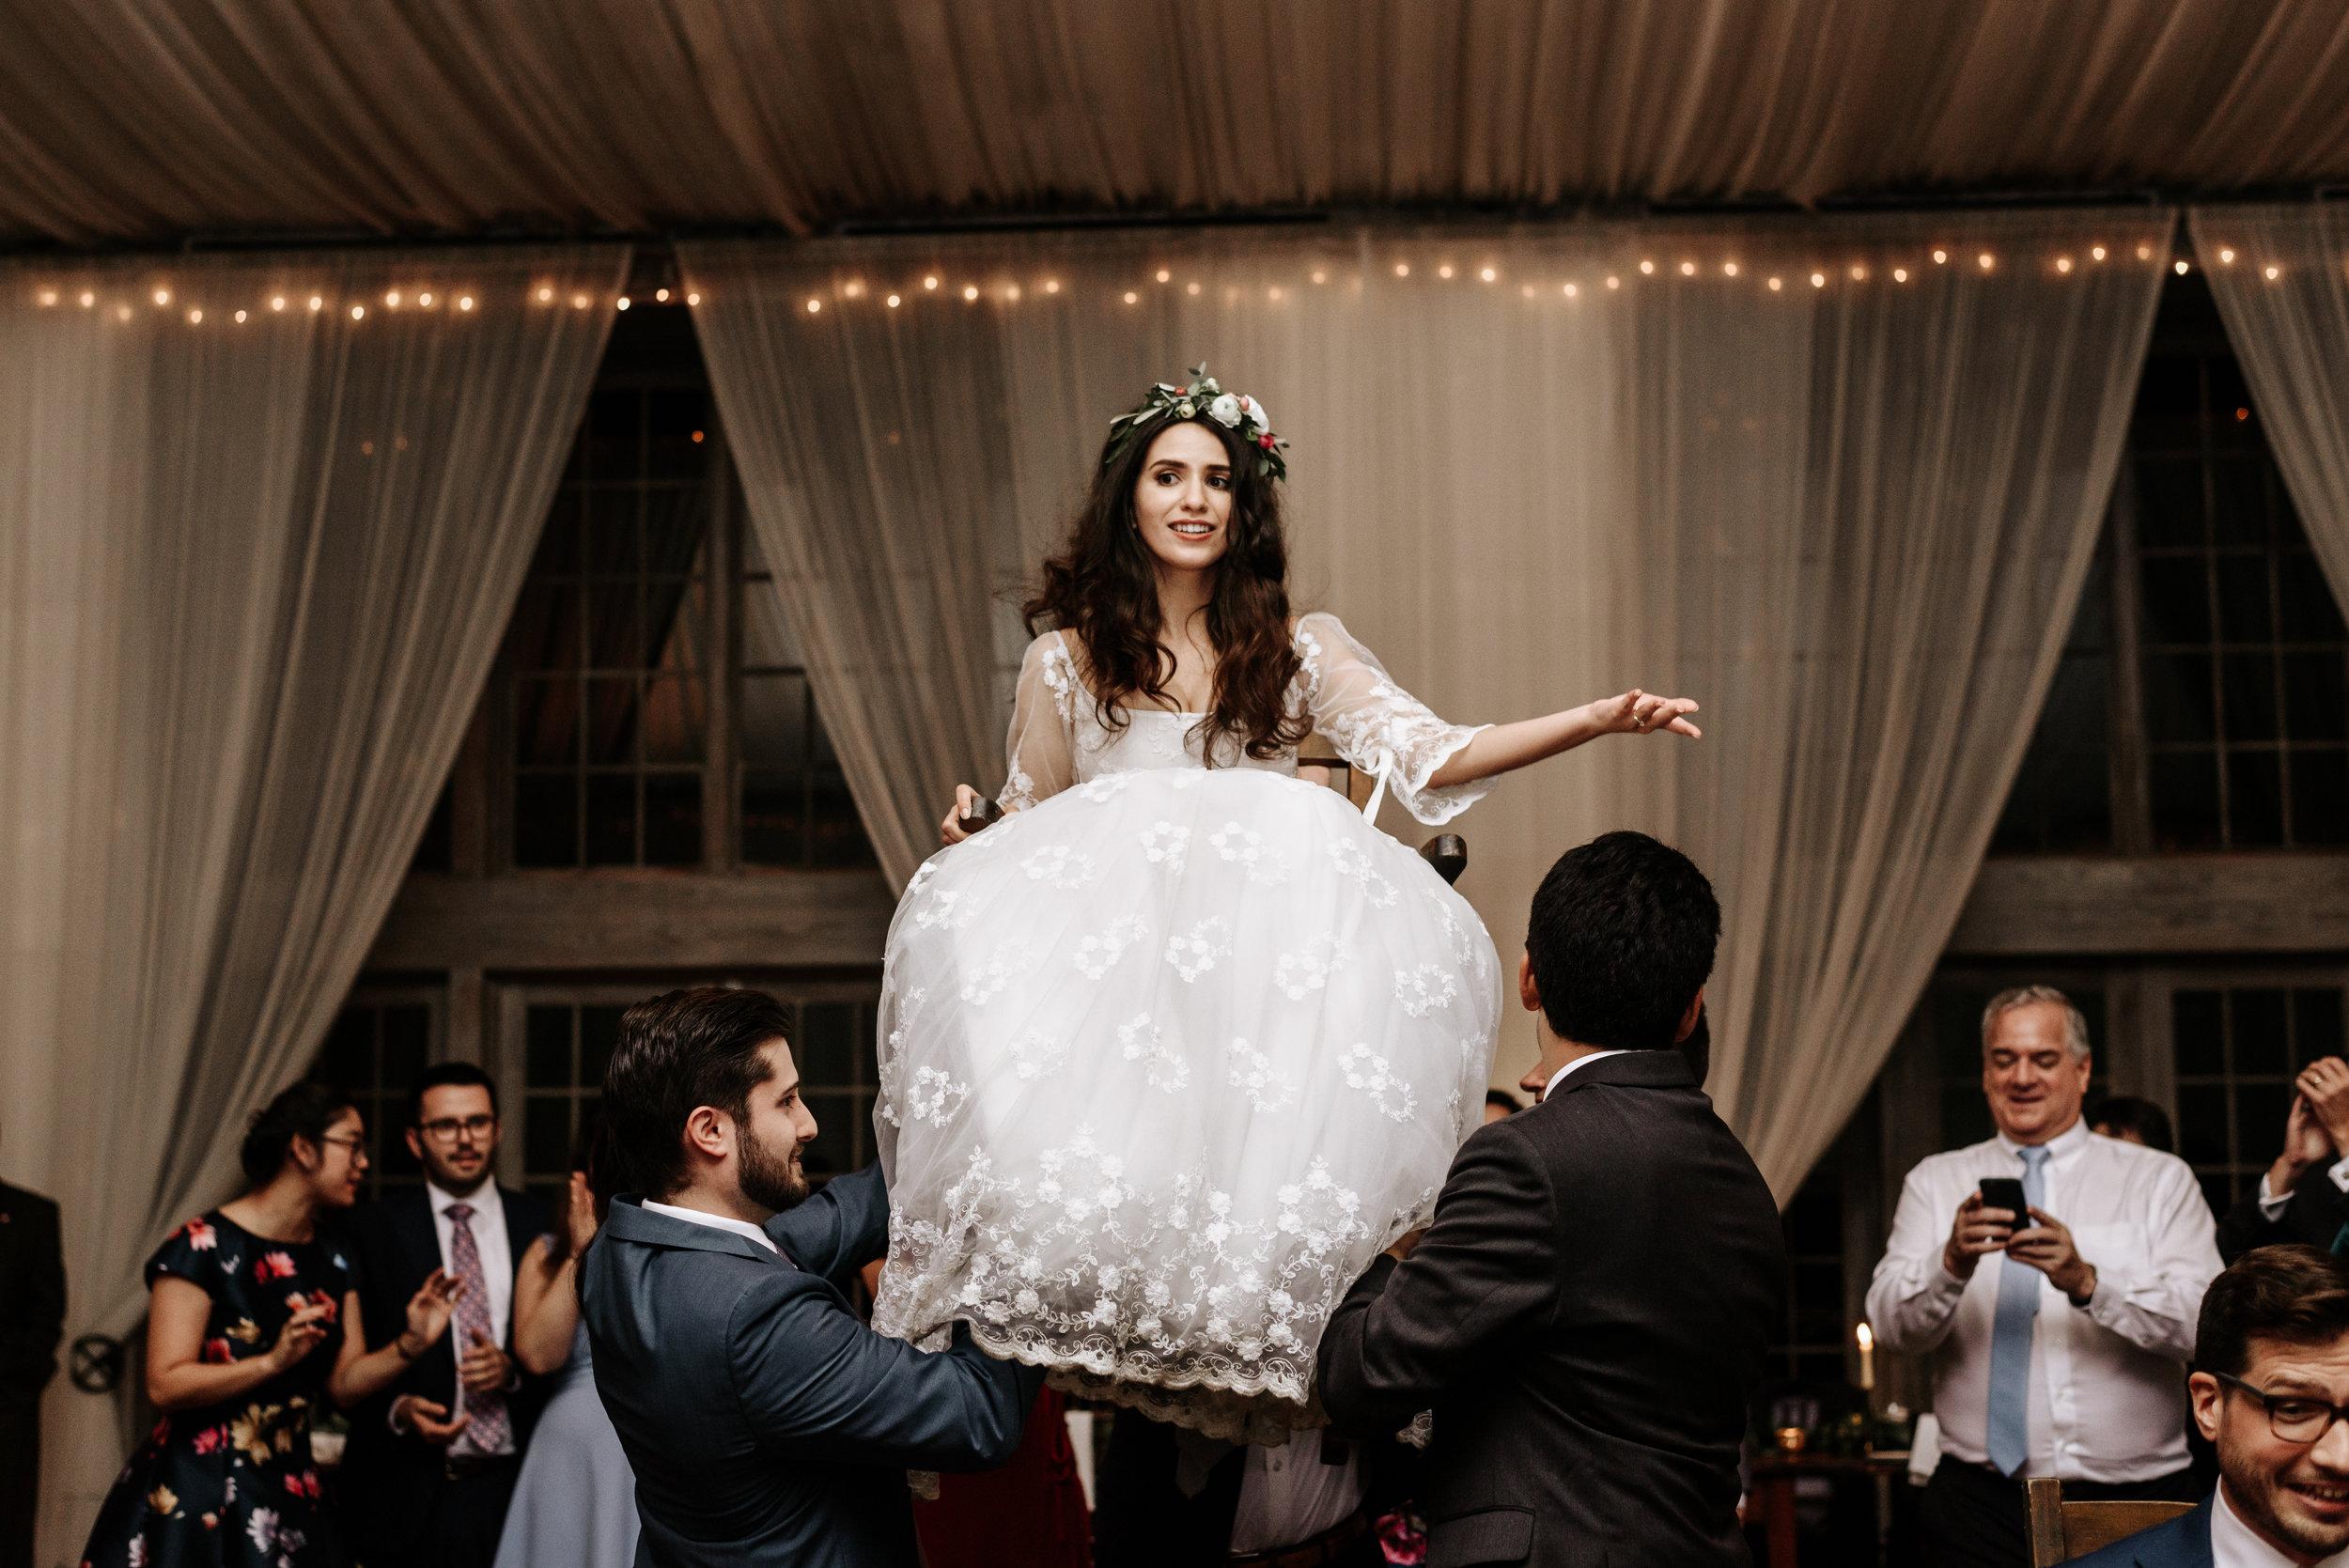 Veritas-Vineyards-and-Winery-Wedding-Photography-Afton-Virginia-Yasmin-Seth-Photography-by-V-3267.jpg